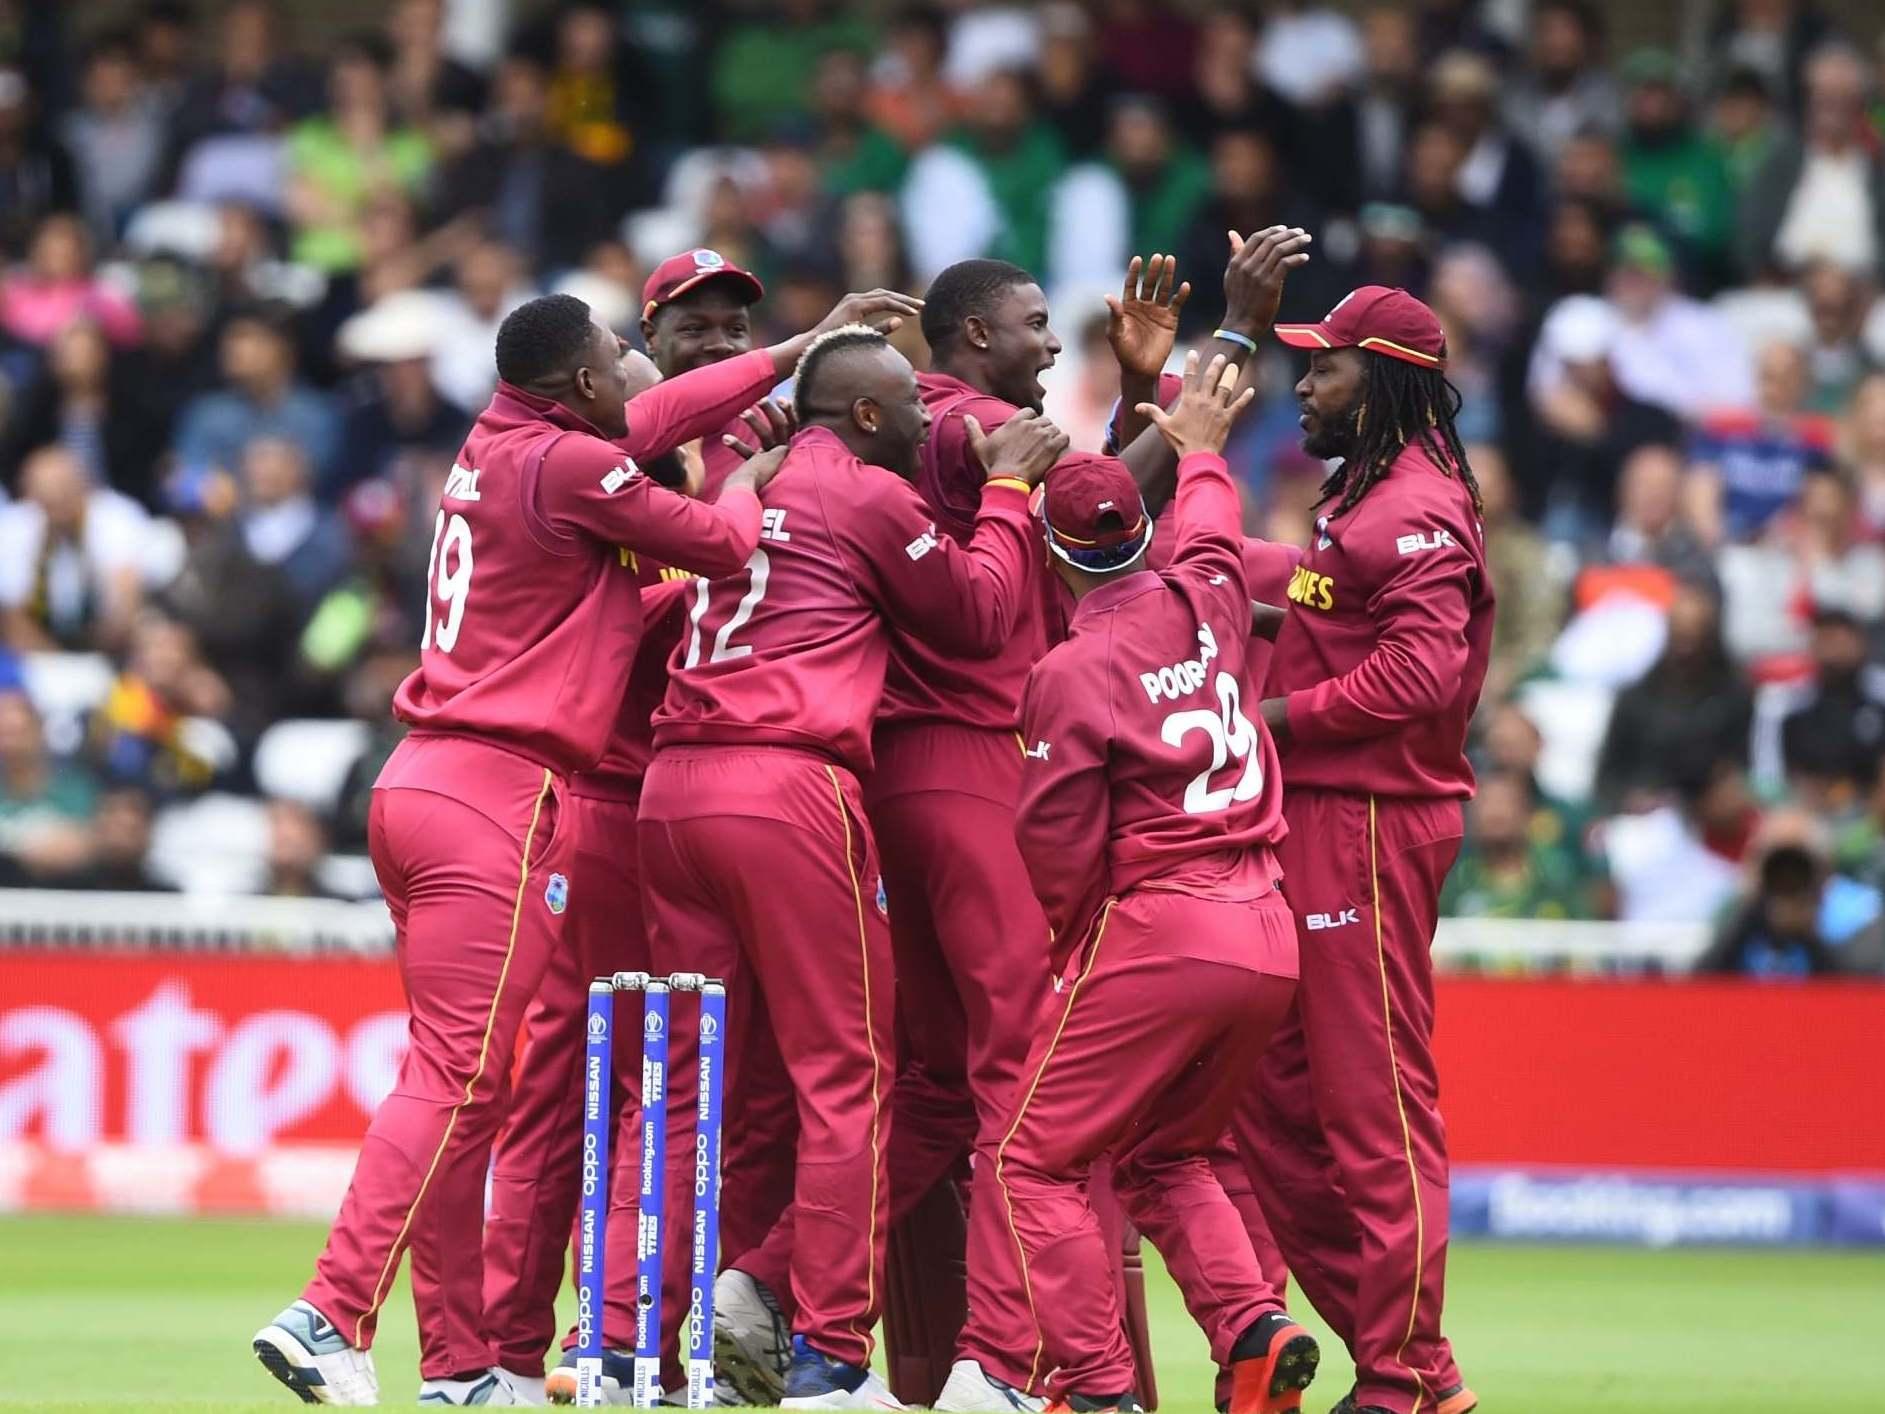 Cricket World Cup 2019 Pakistan Vs West Indies Player -5785